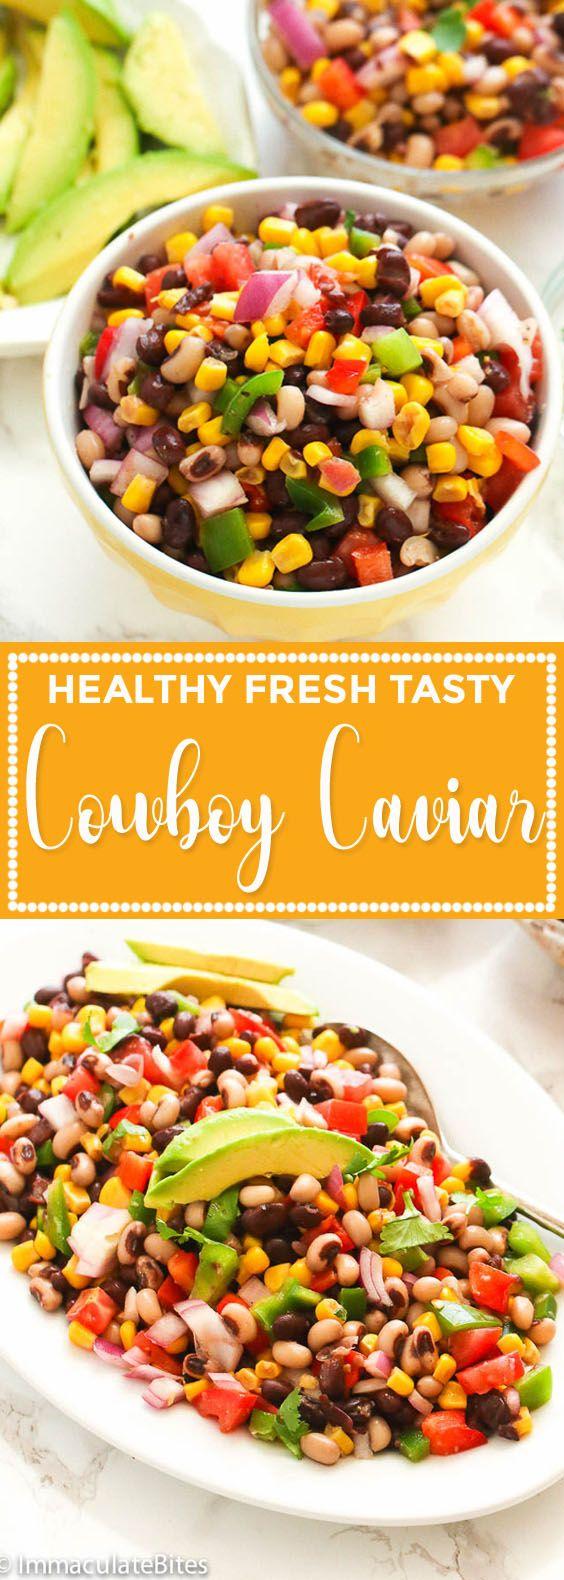 Cowboy Caviar - Immaculate Bites